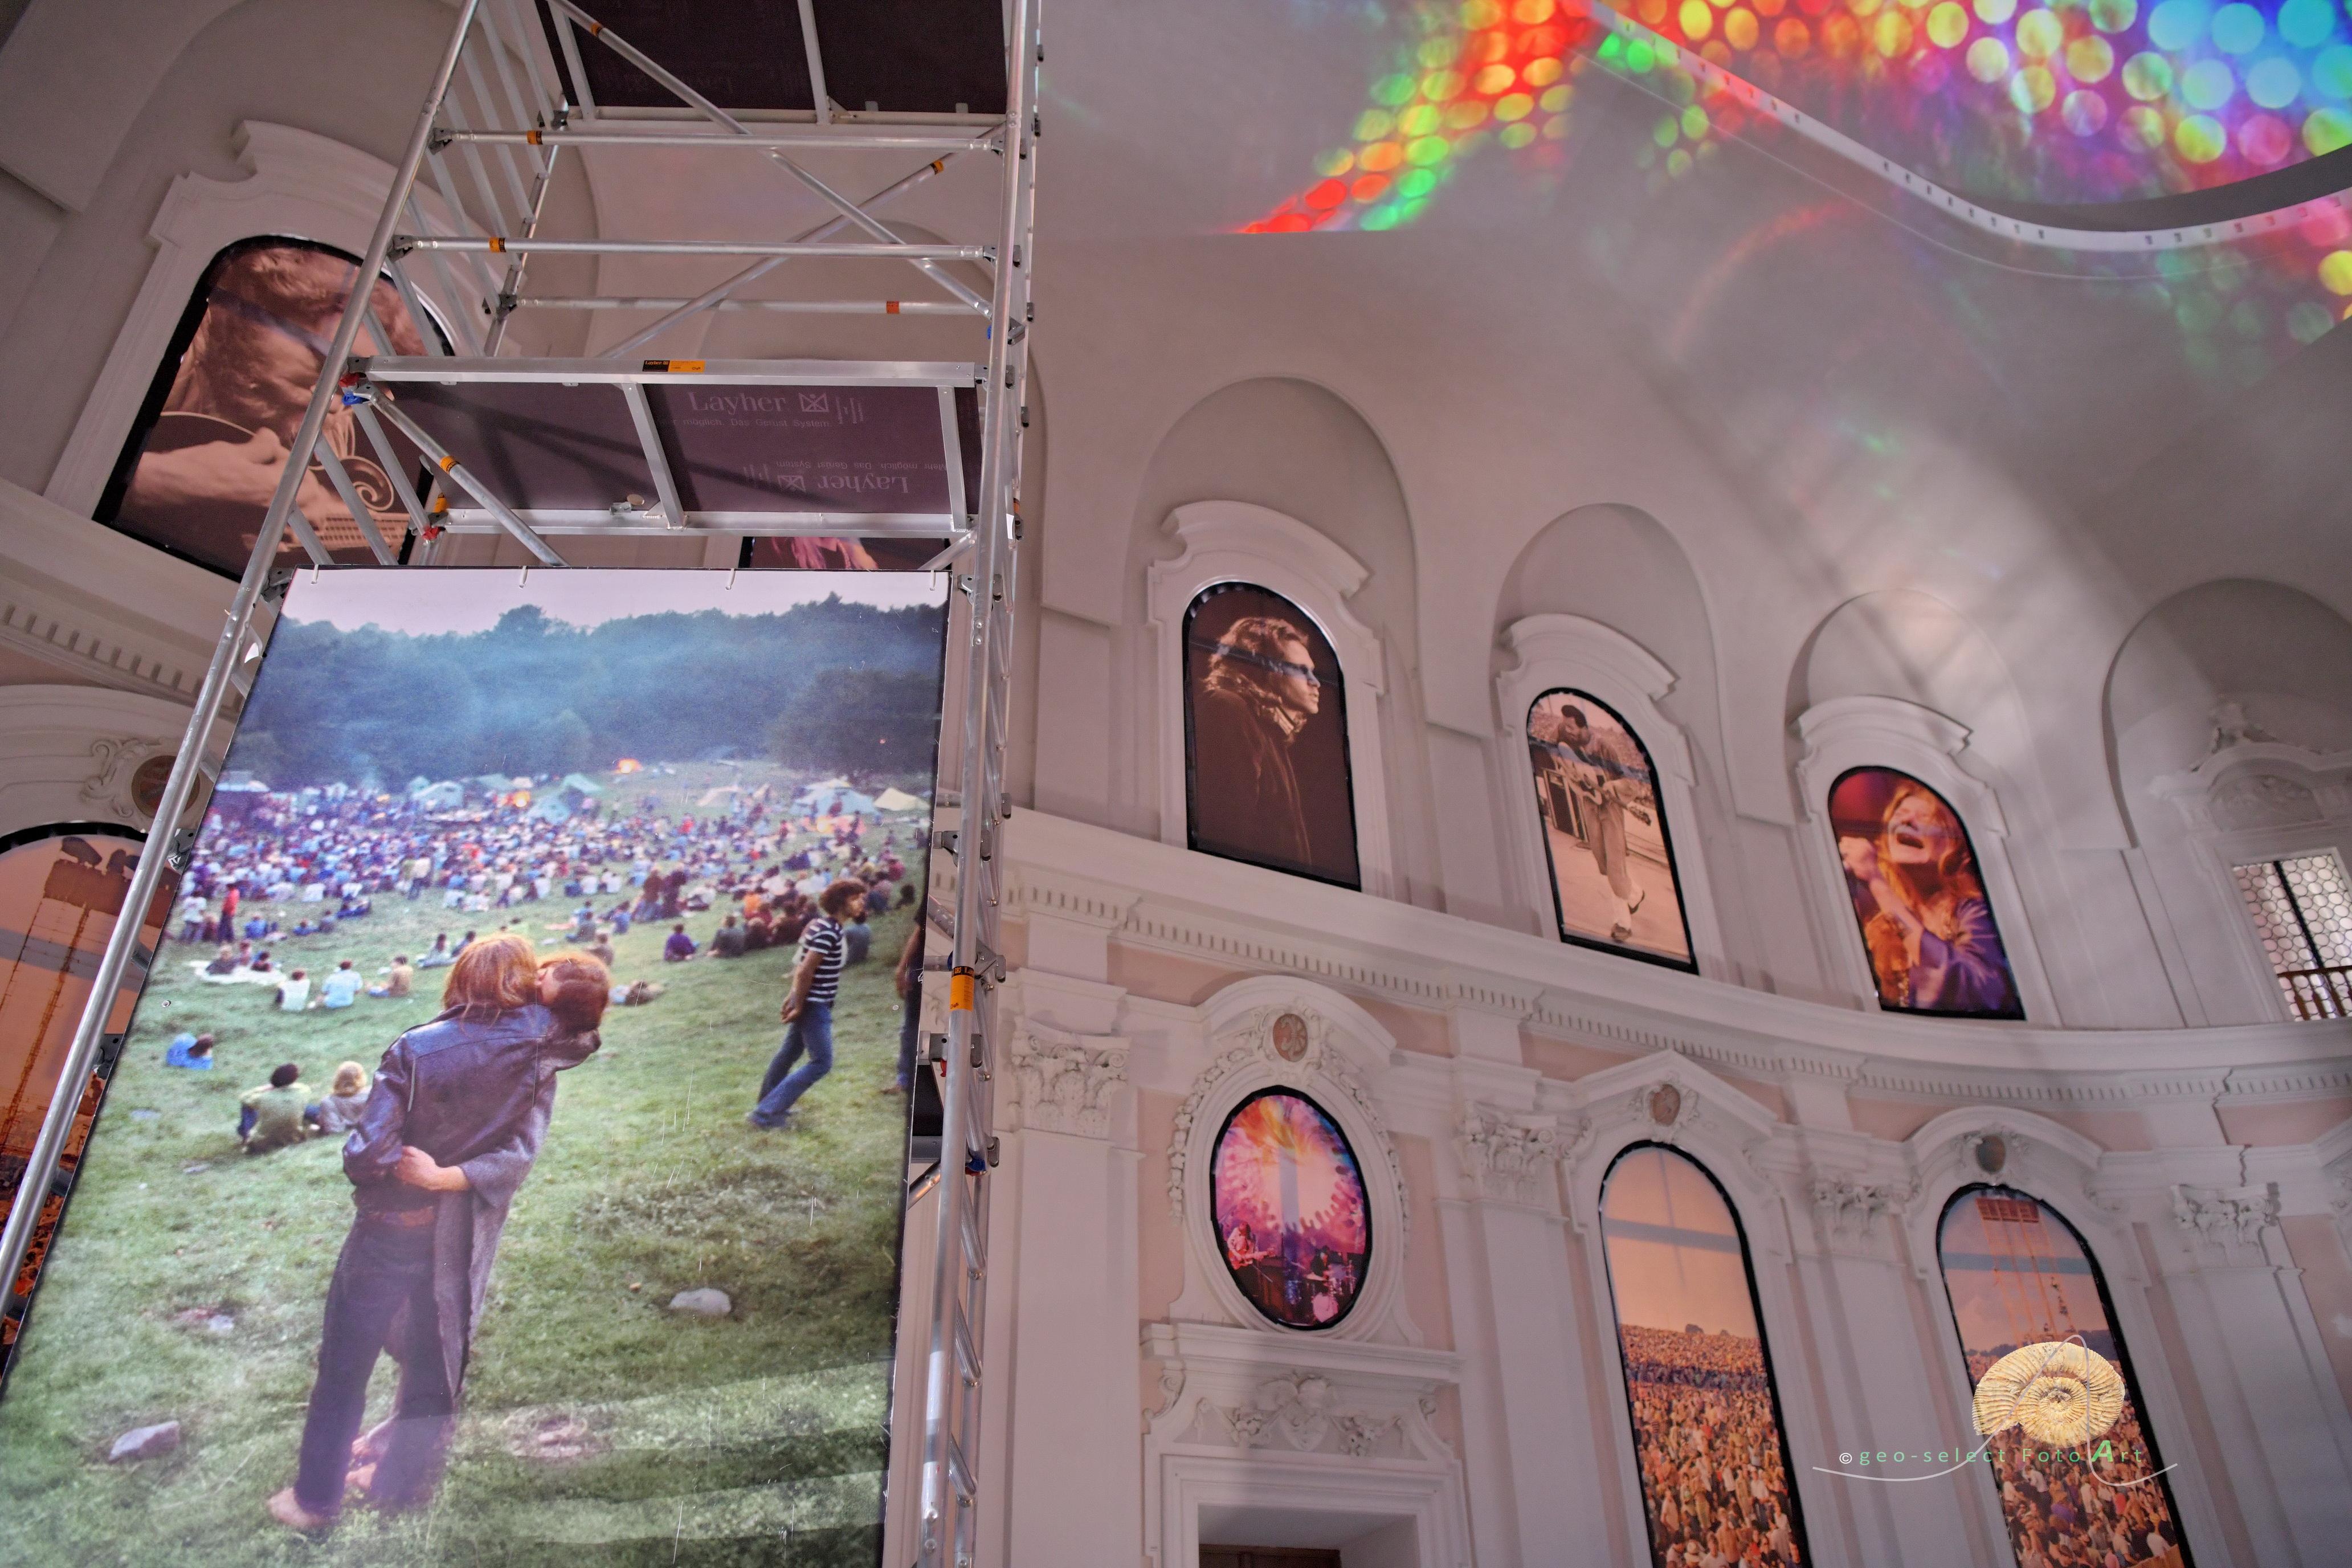 Woodstock Ausstellung Nürnberg